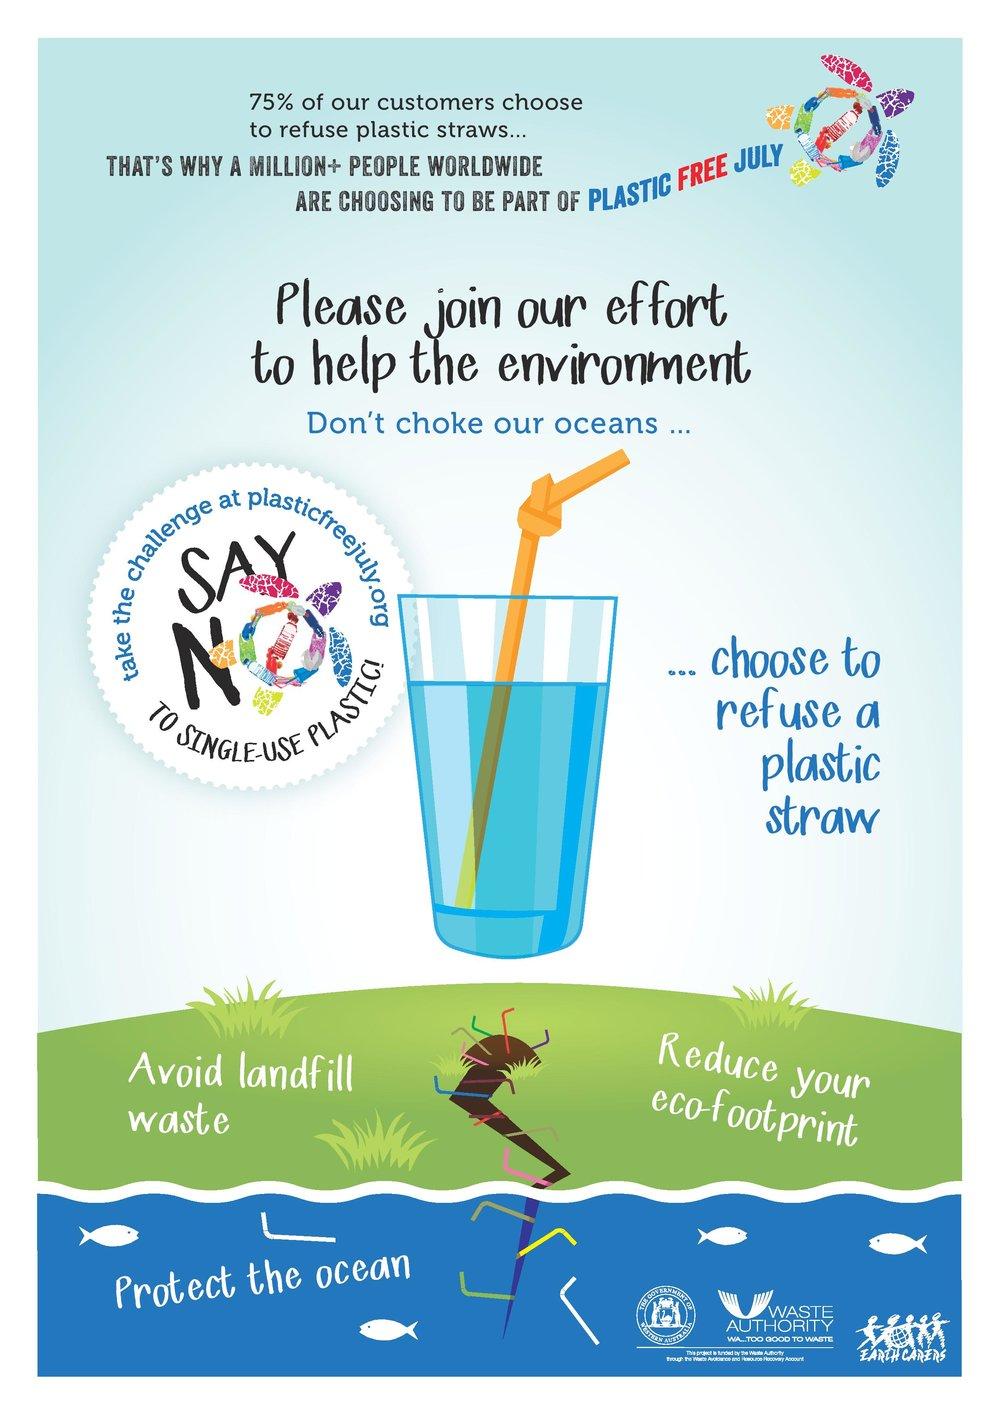 Plastic Free July tool kit poster straws worldwide-page-001.jpg